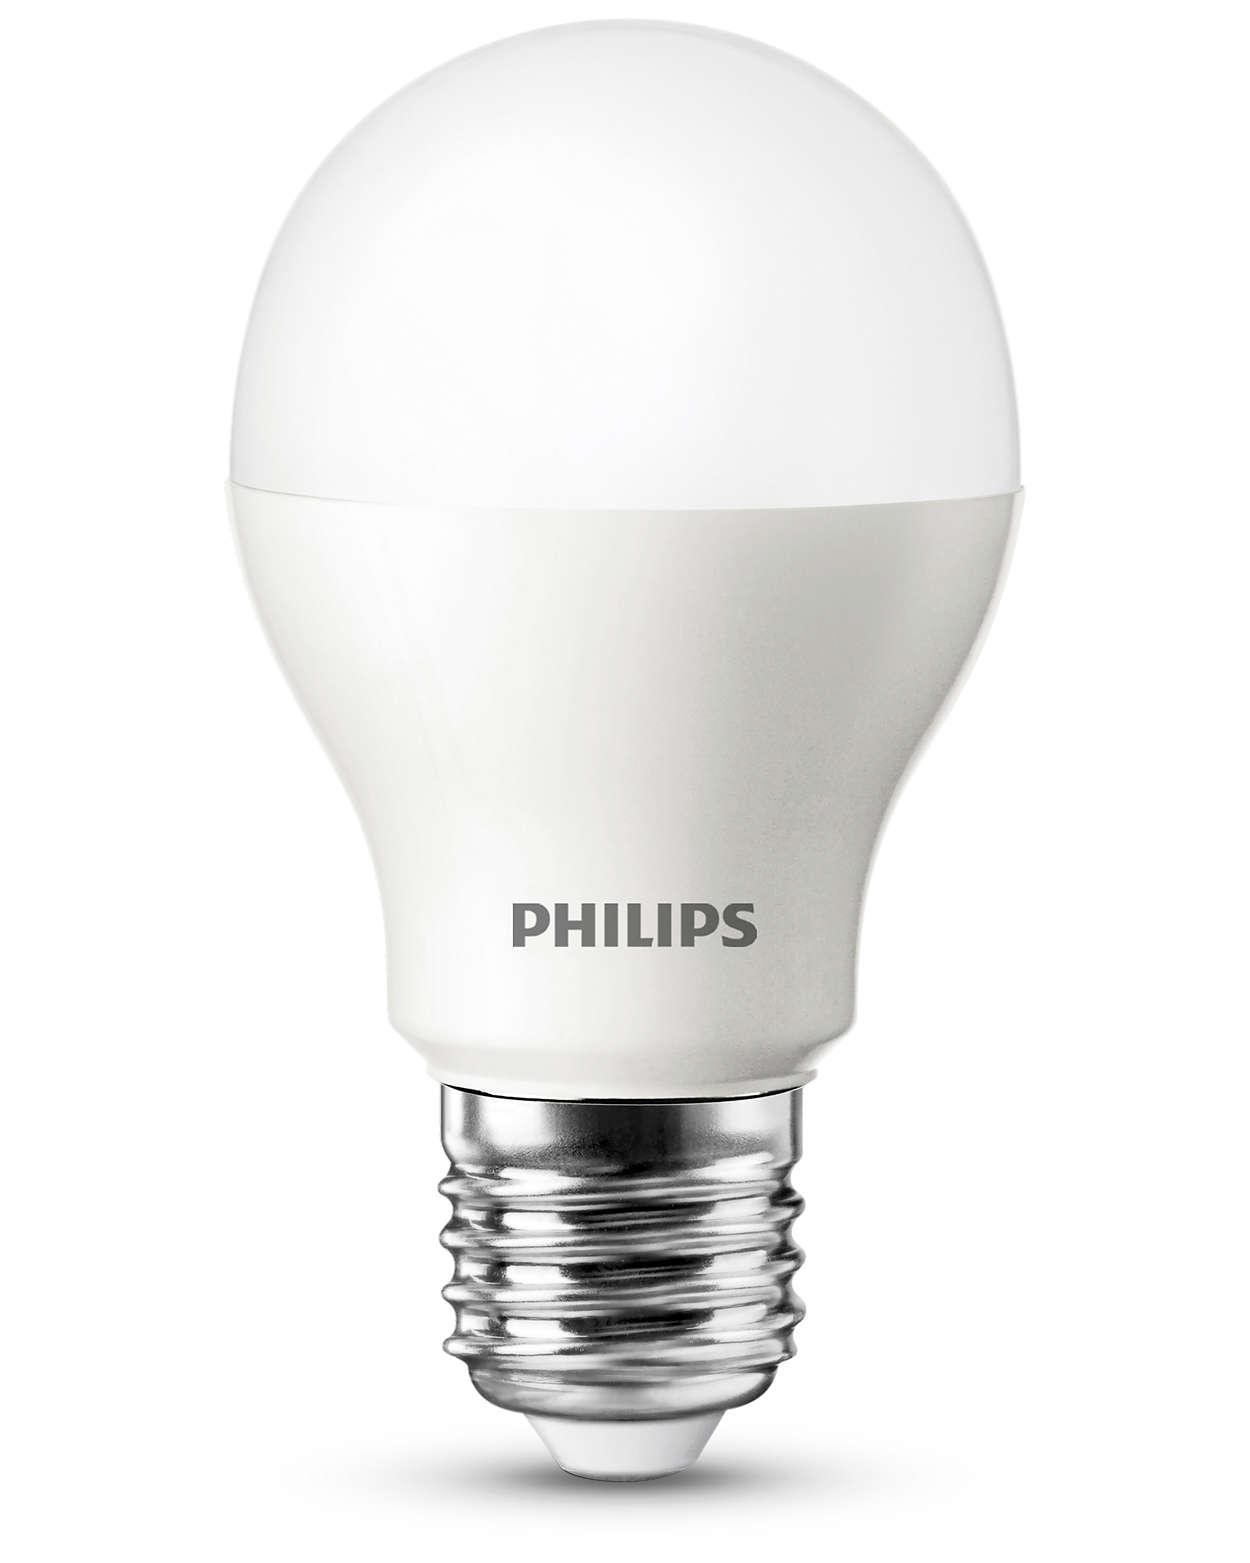 download image - Ikea Led Lampen